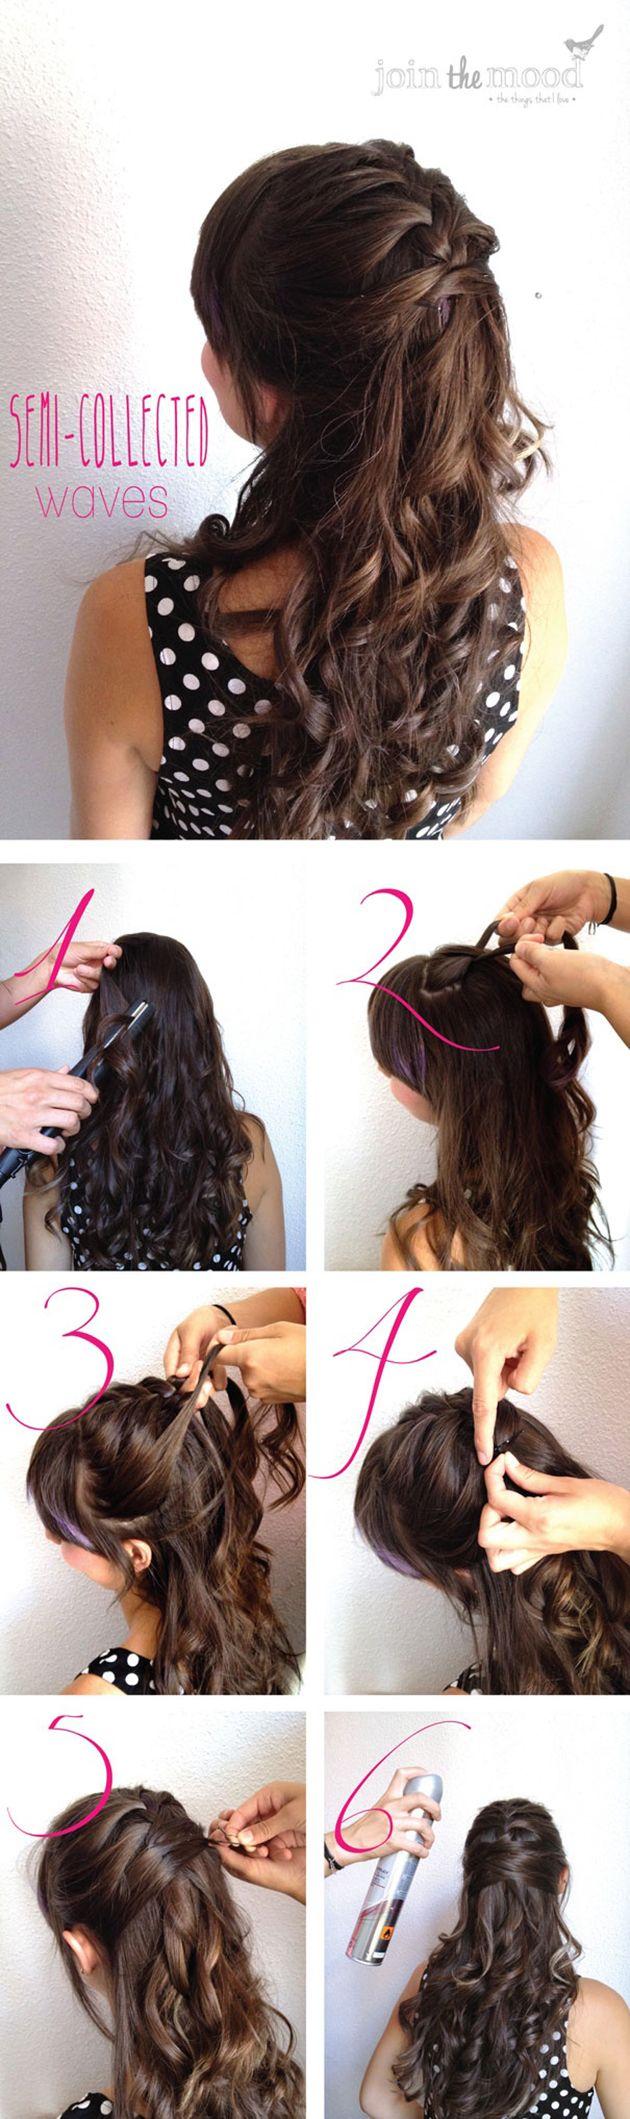 best Bal haren images on Pinterest Wedding hair styles